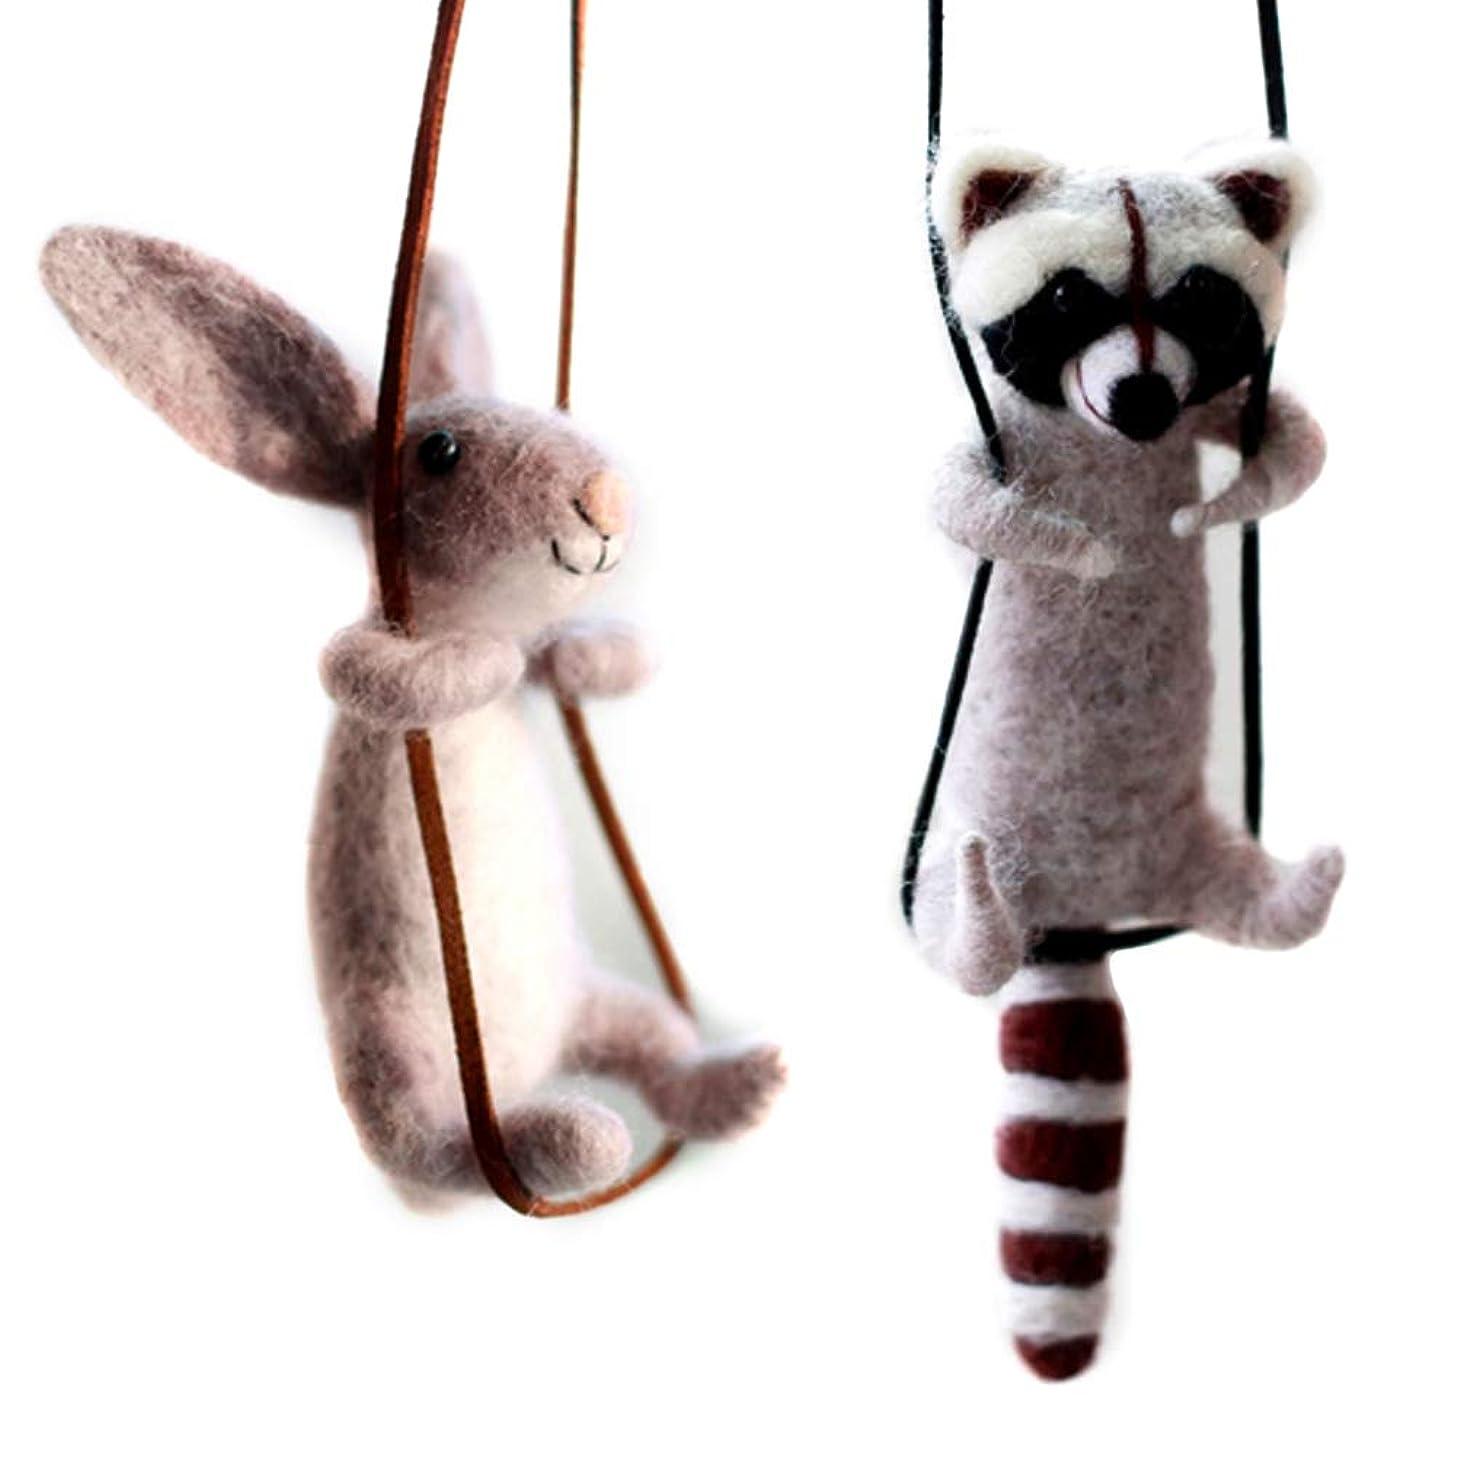 Artec360 Raccoon and Rabbit Needle Felting Kits 4